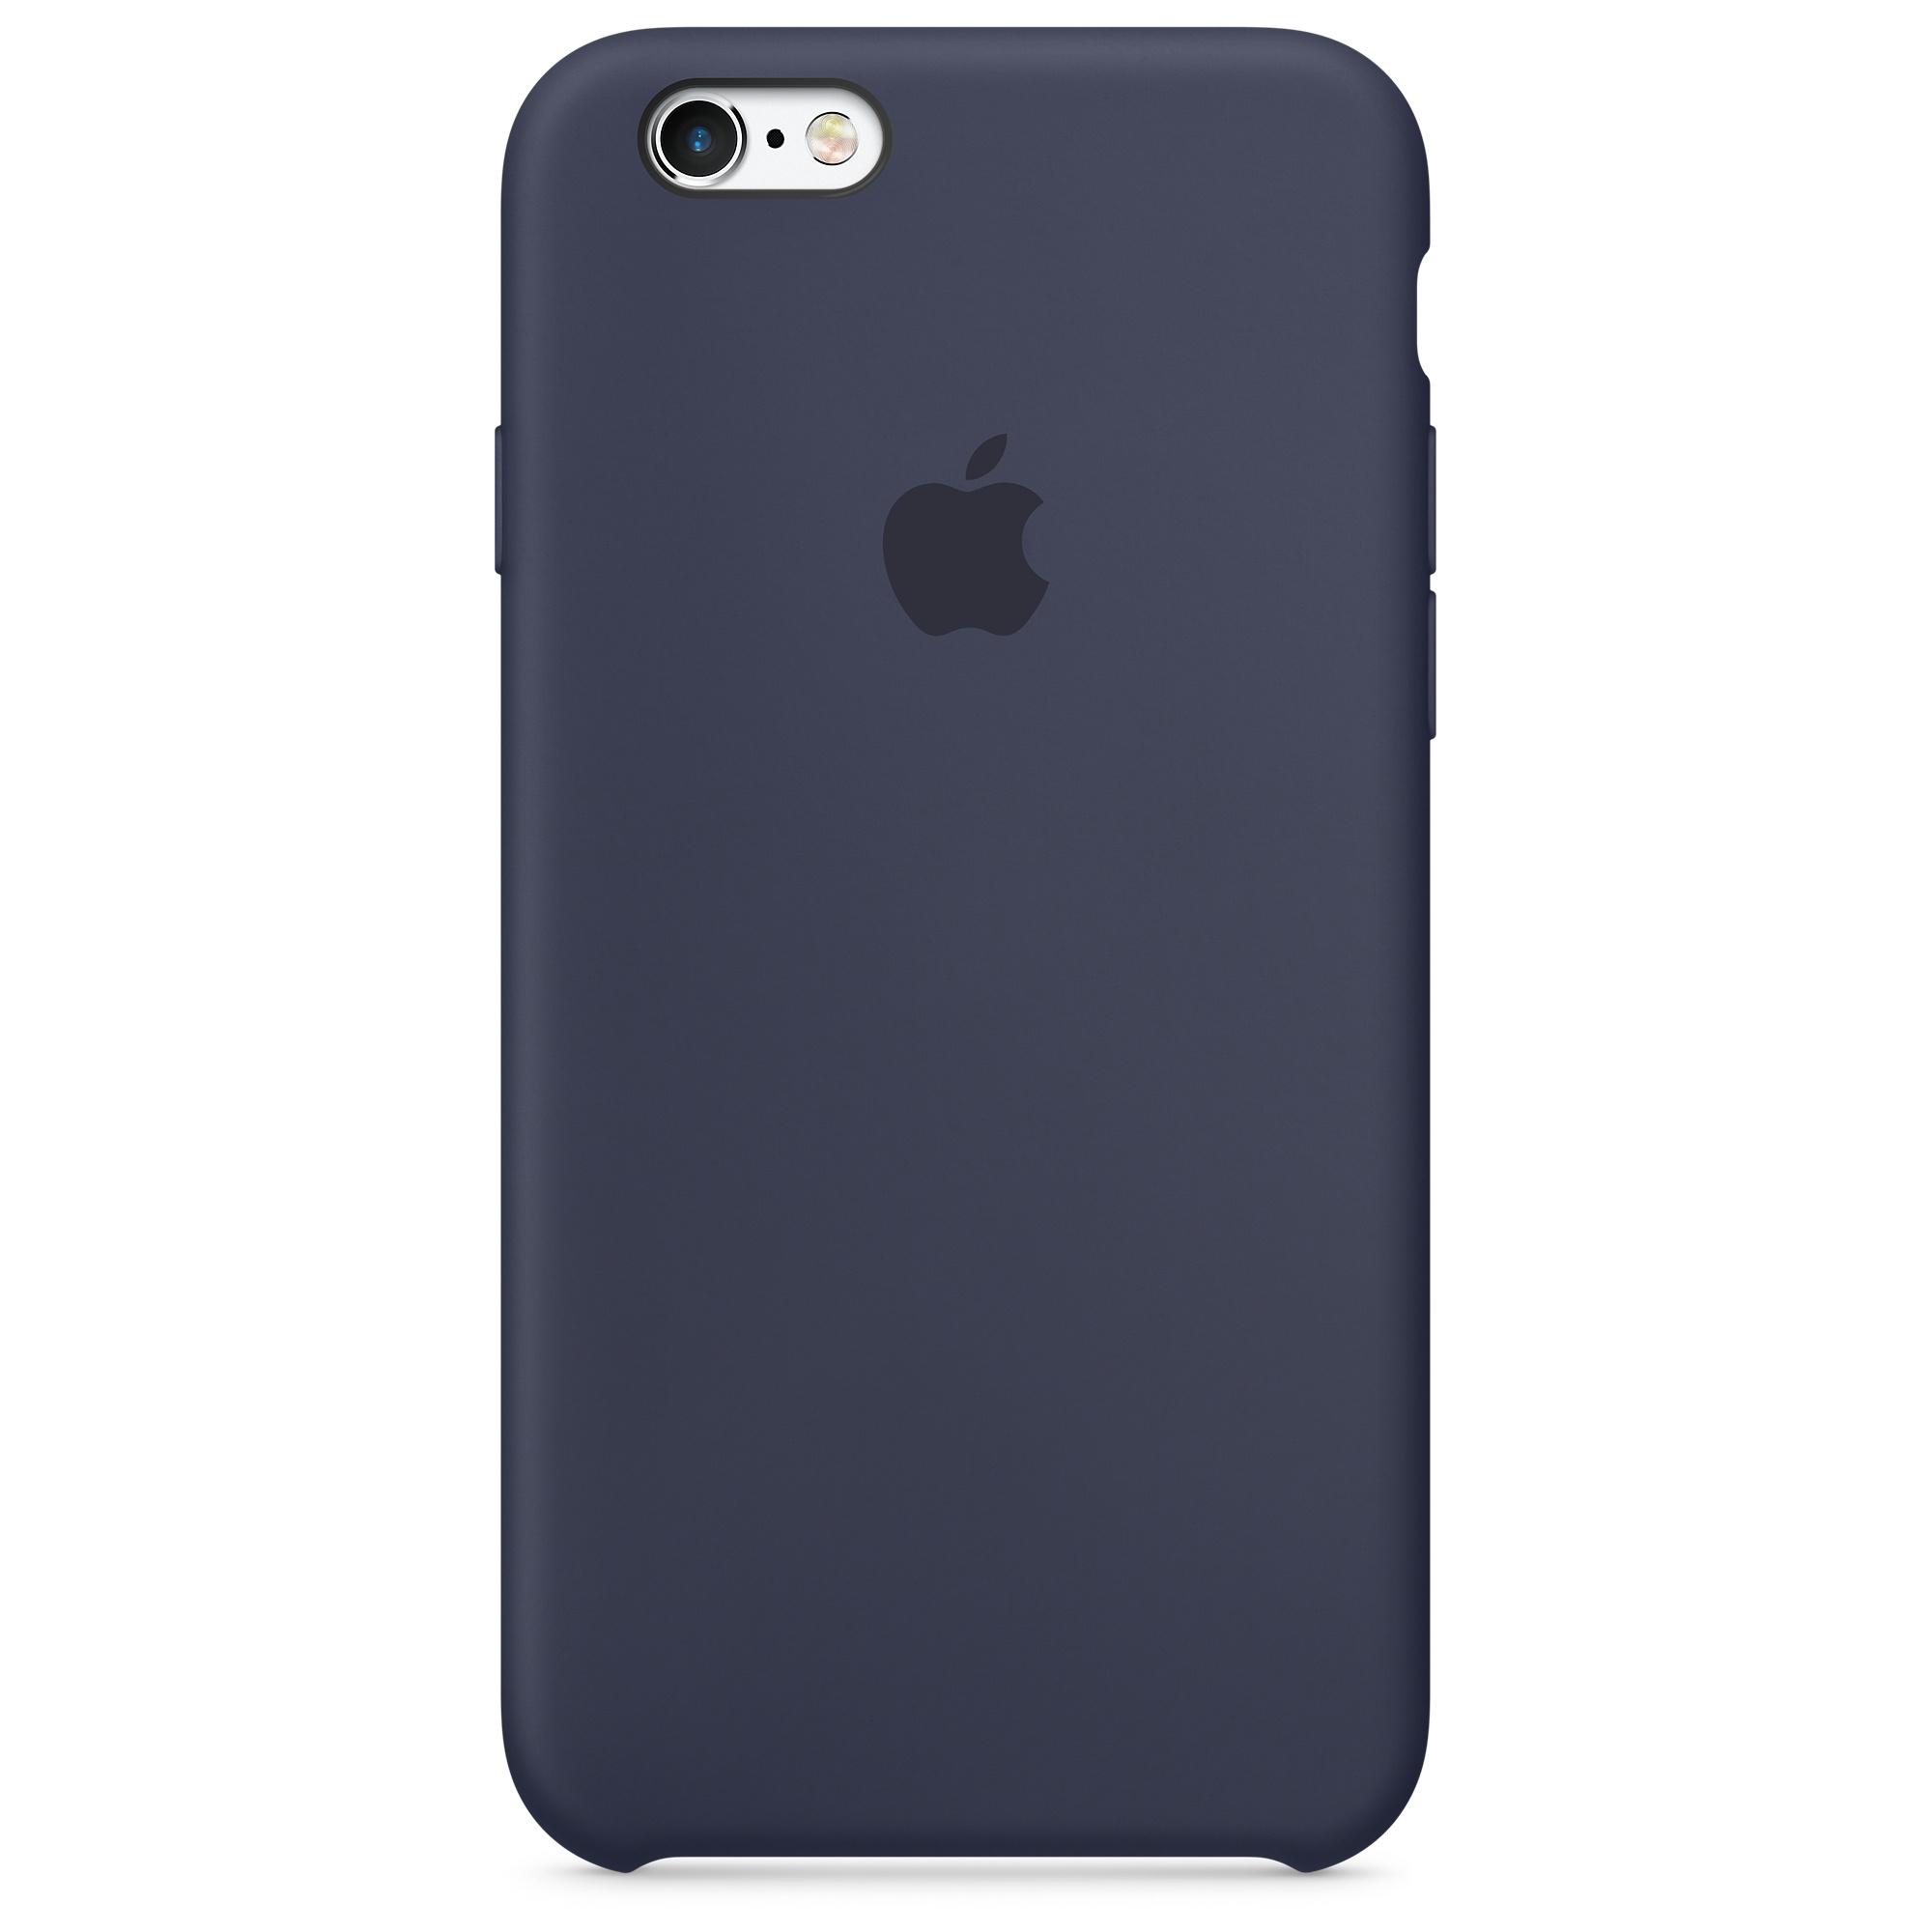 Pouzdro / kryt pro Apple iPhone 6 / 6S - Apple, Silicone Case Midnight Blue